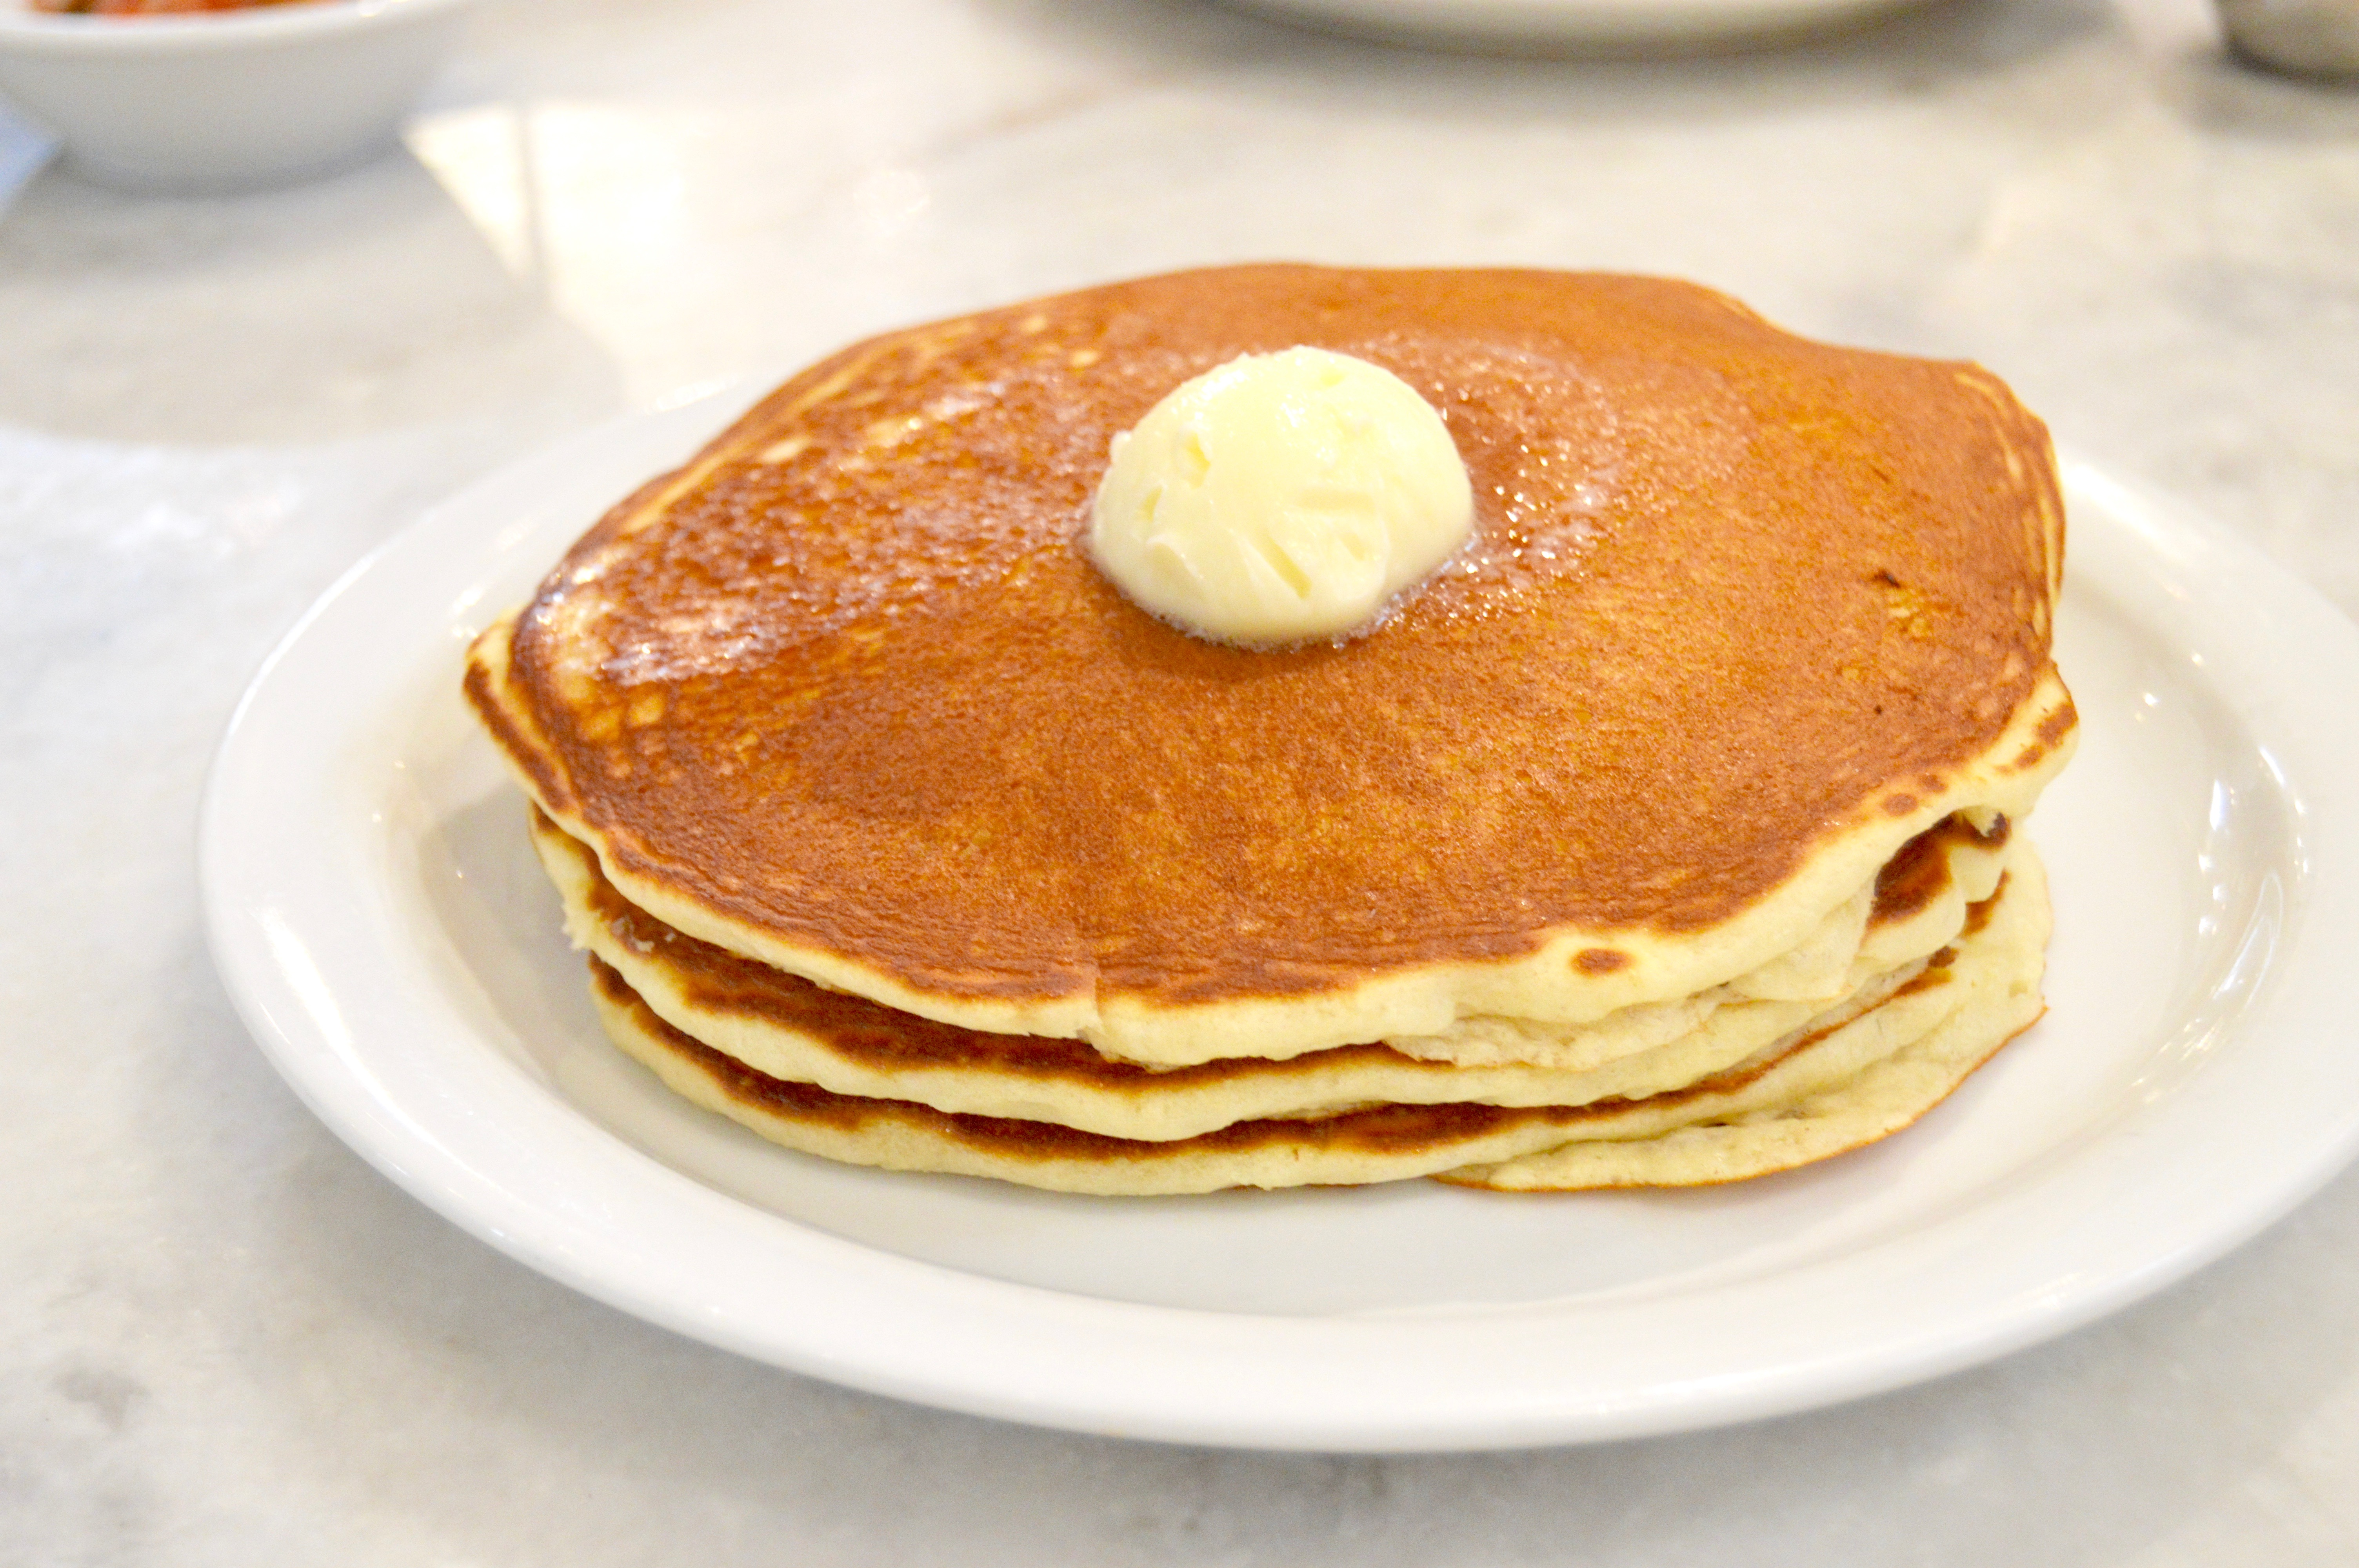 Pancakes at Joan's on Third